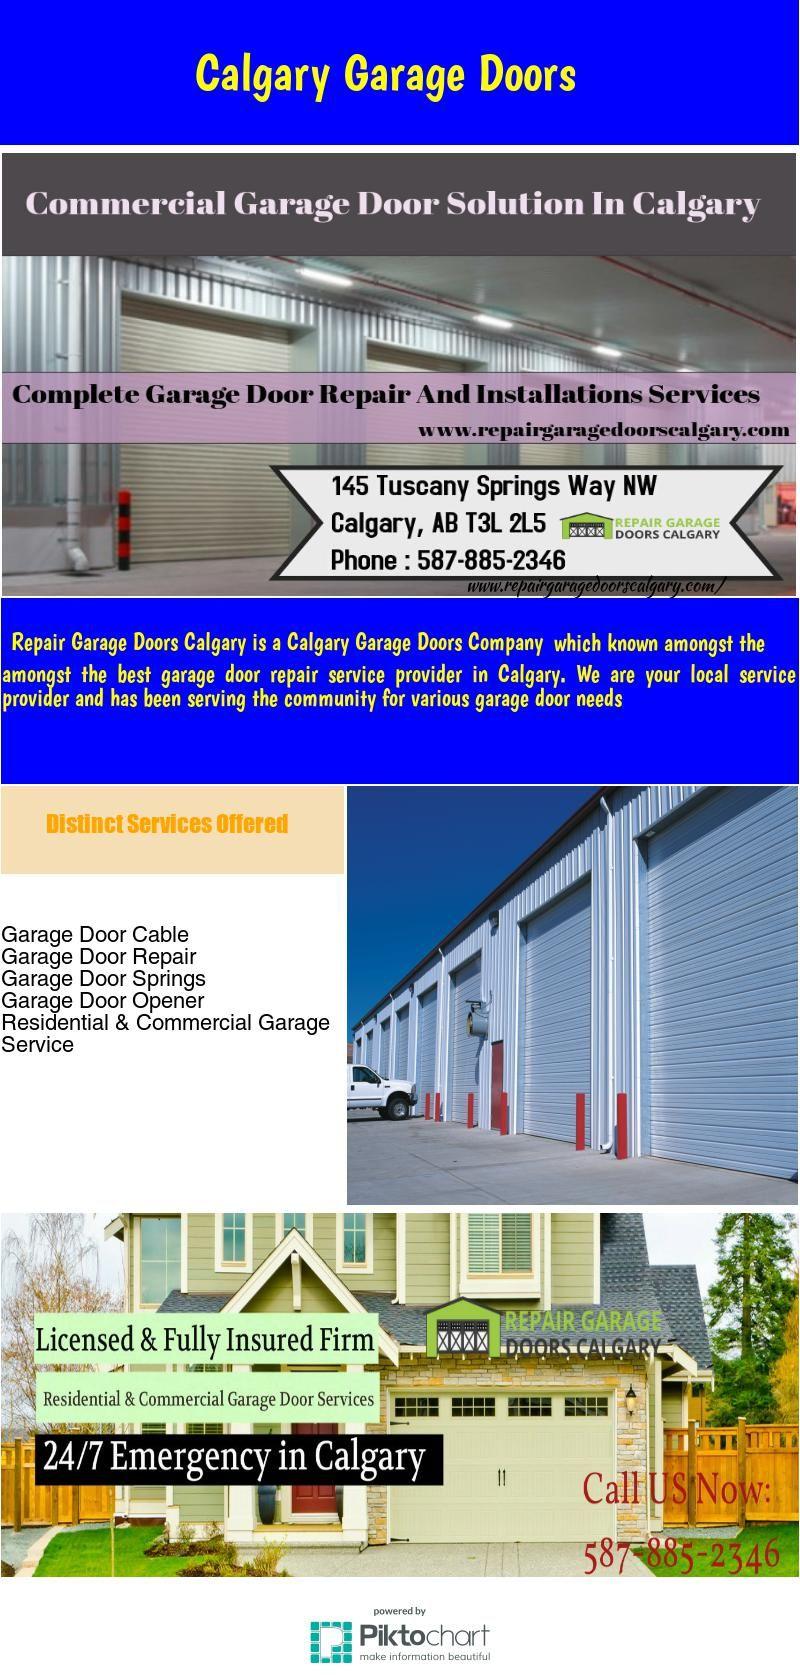 Repair Garage Doors Calgary Offers Leading Garage Door Repair